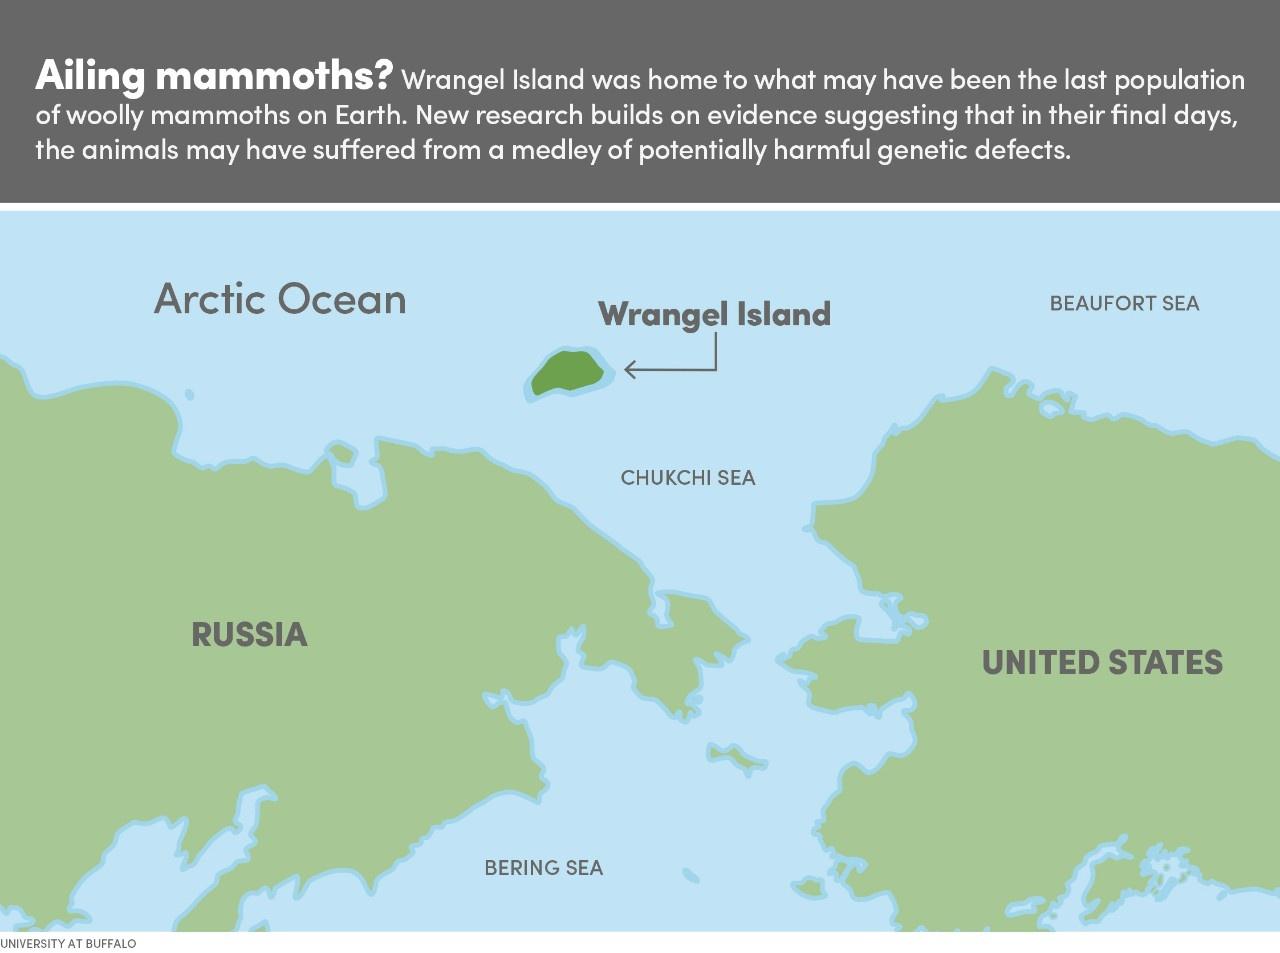 Scientists resurrected a Wrangel Island mammoth's mutated genes